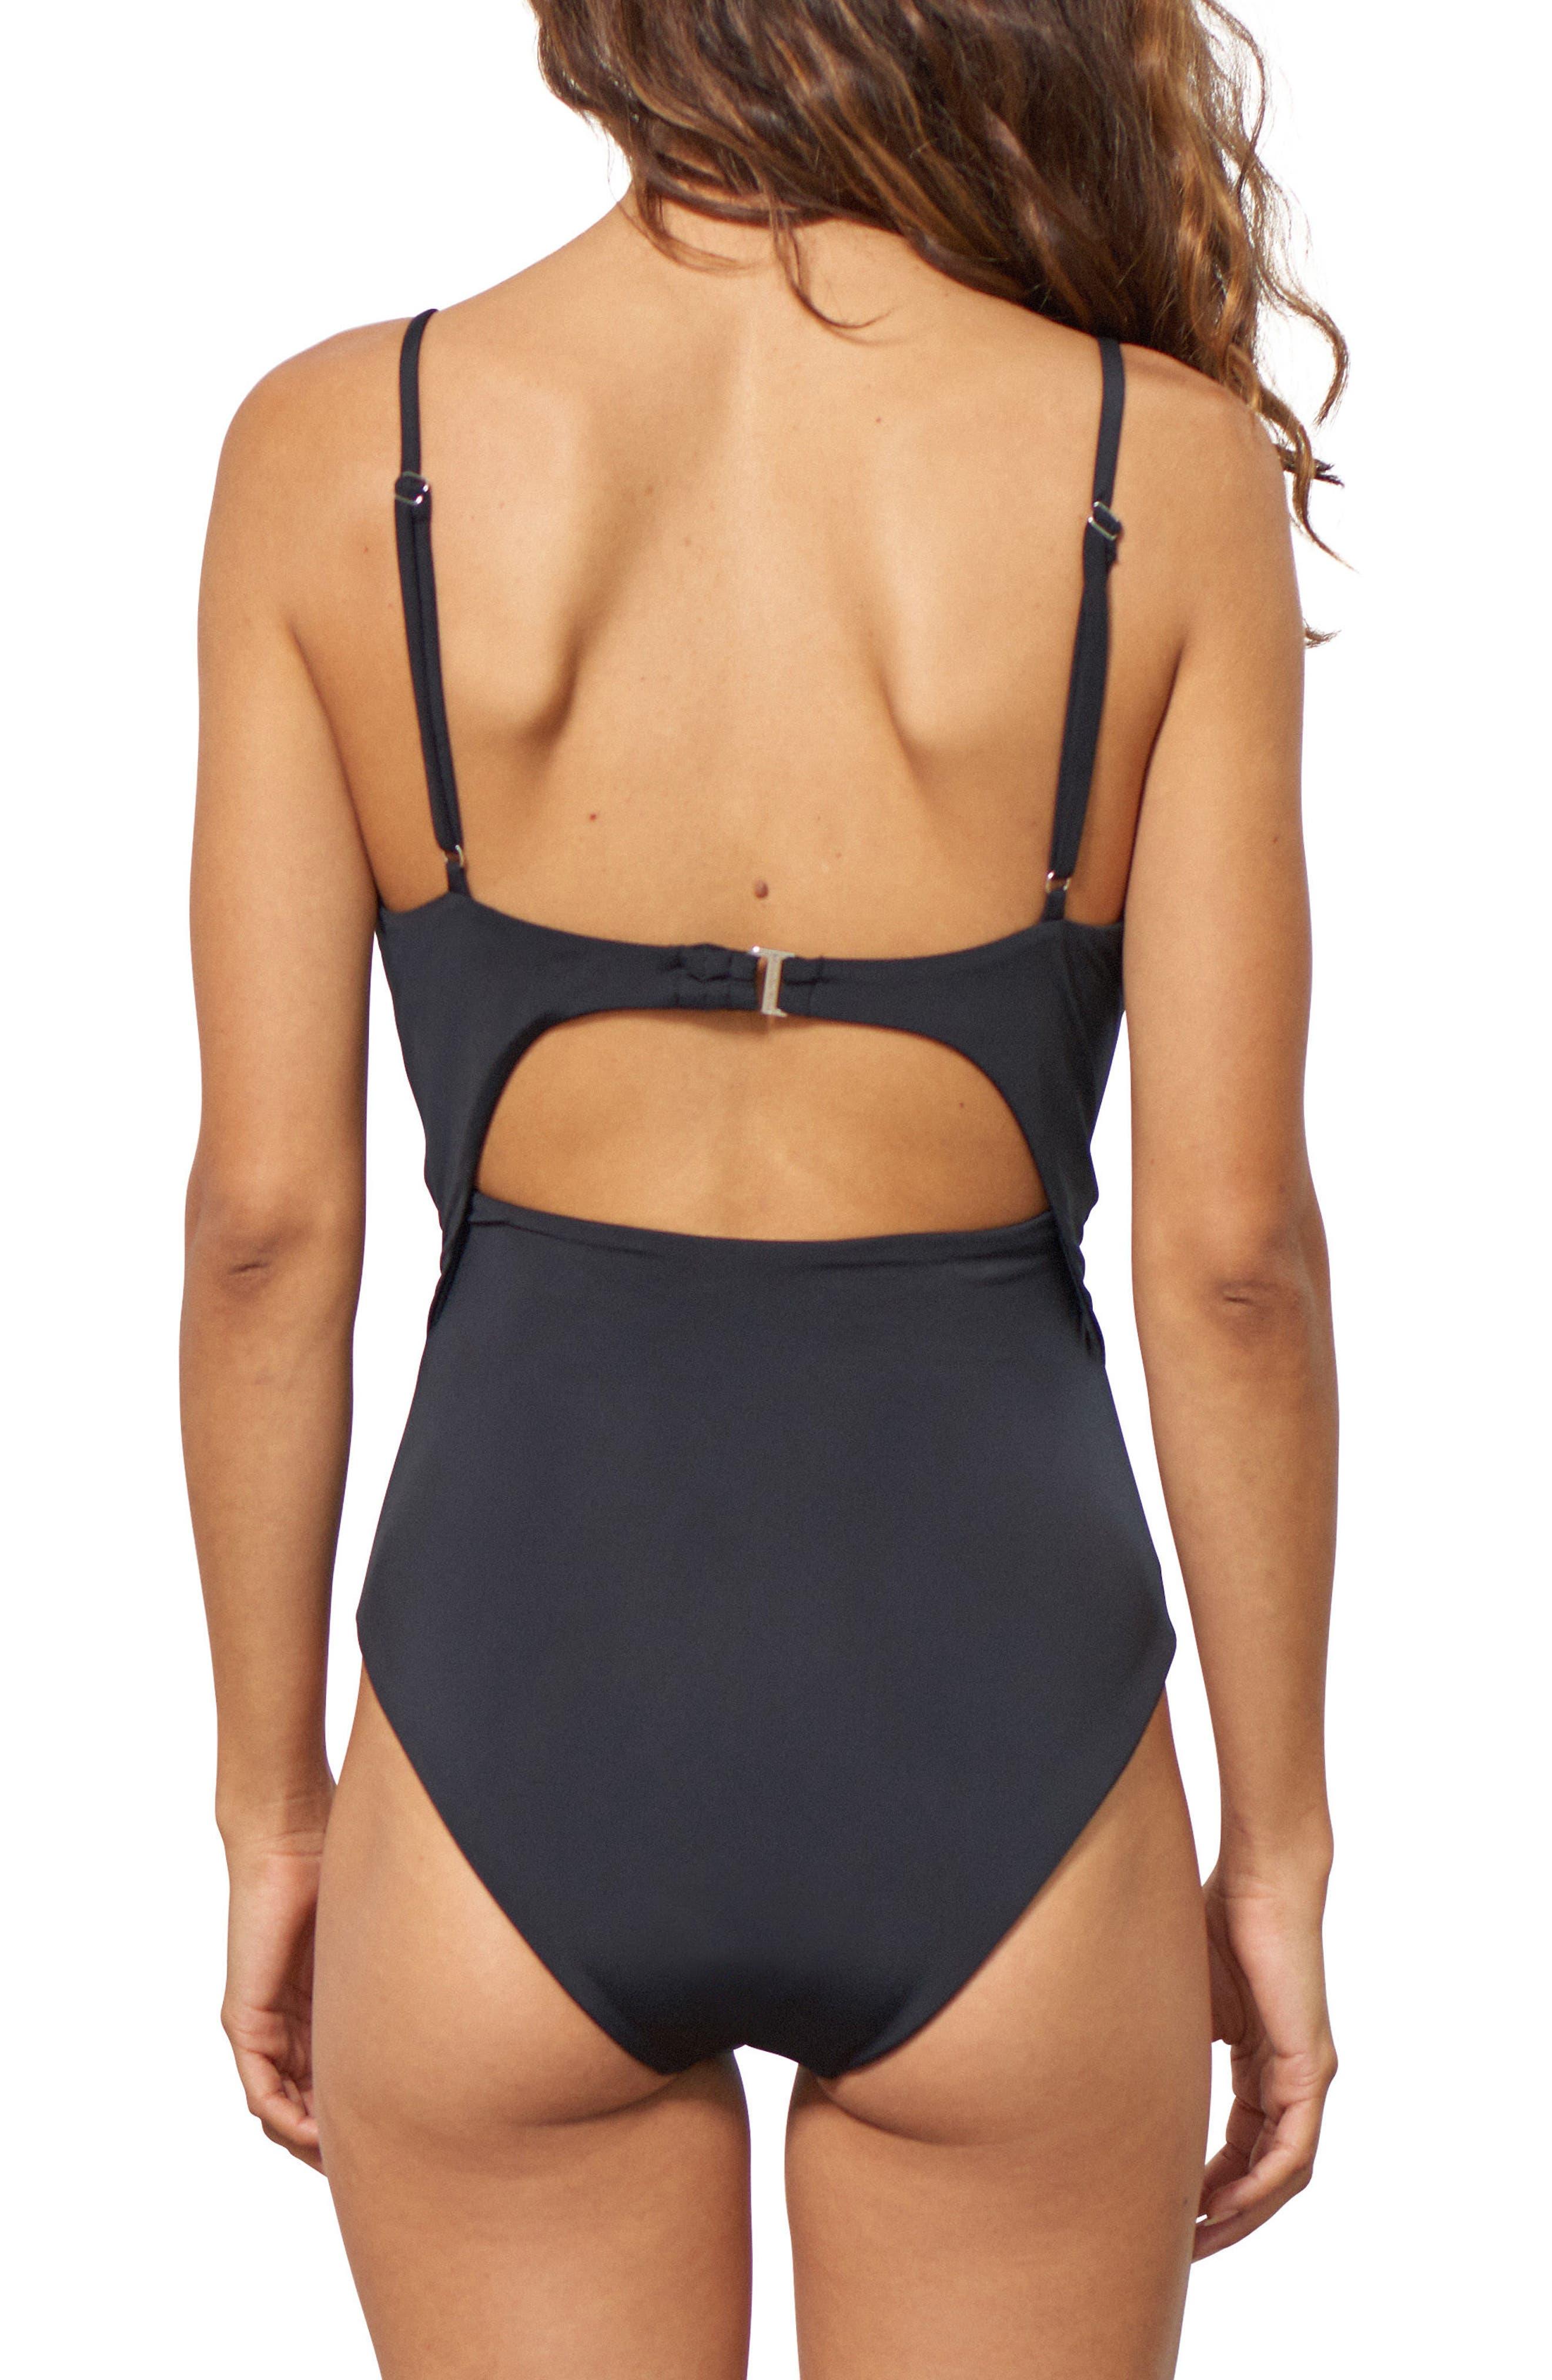 MARA HOFFMAN, Kia Cutout One-Piece Swimsuit, Alternate thumbnail 2, color, BLACK